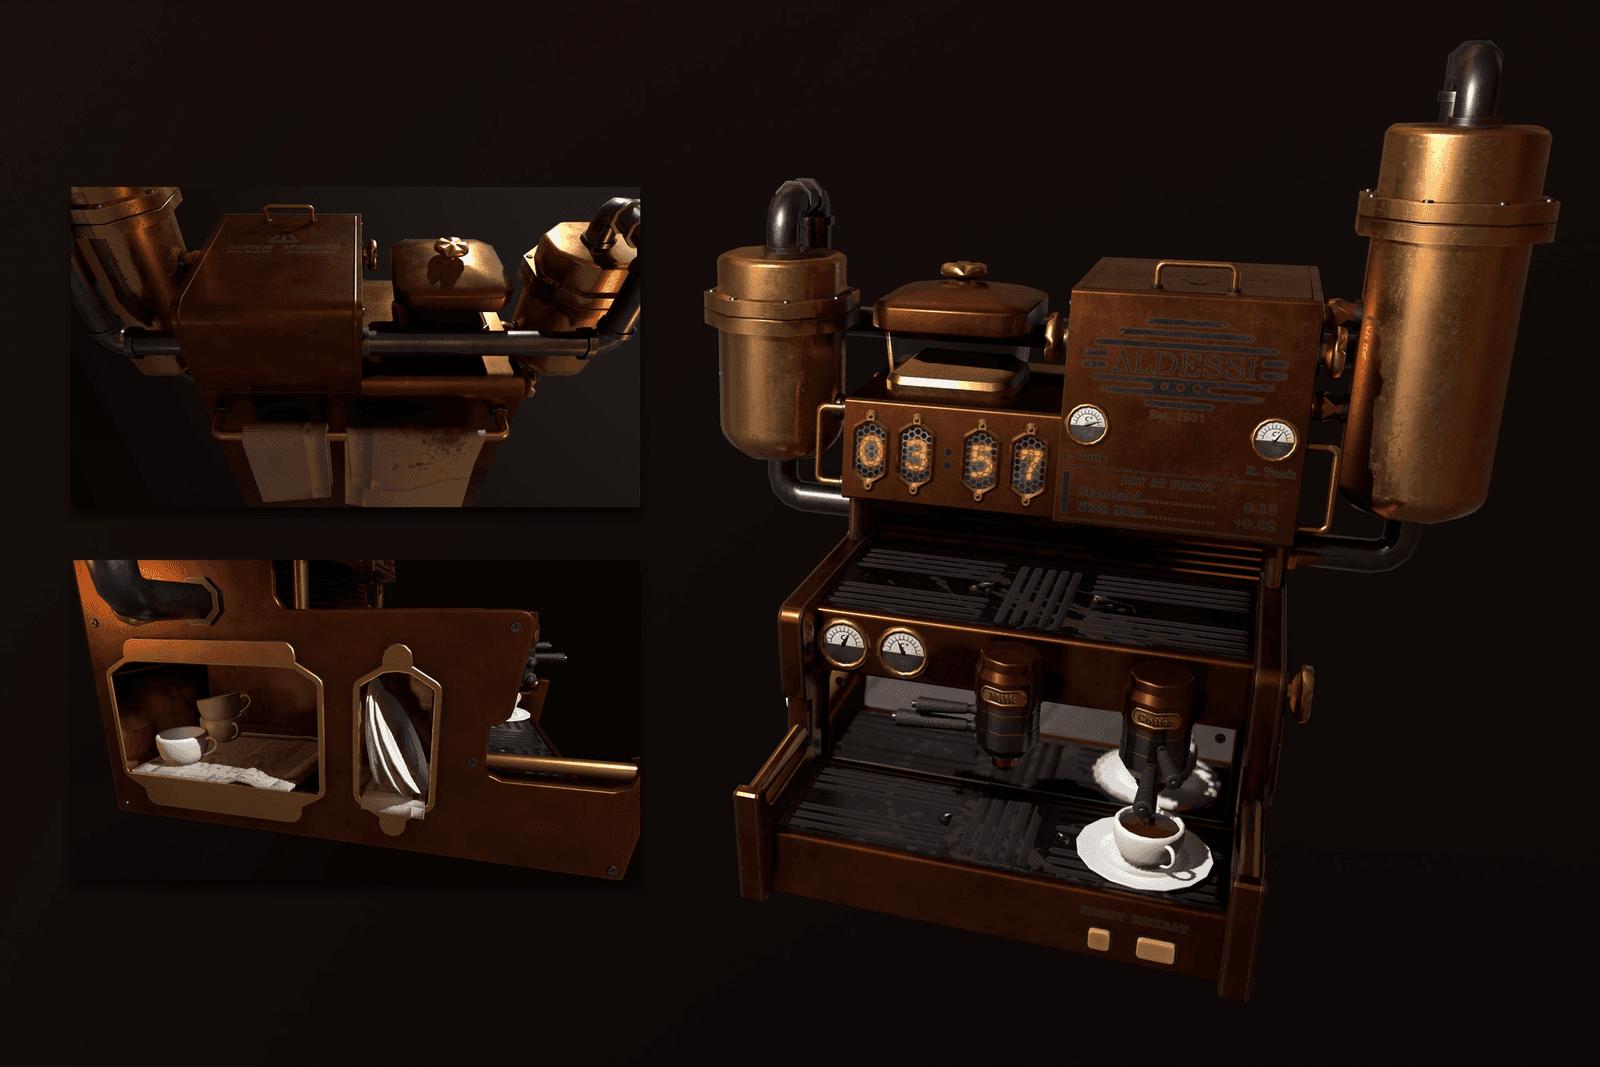 Overengineered Espresso Machine